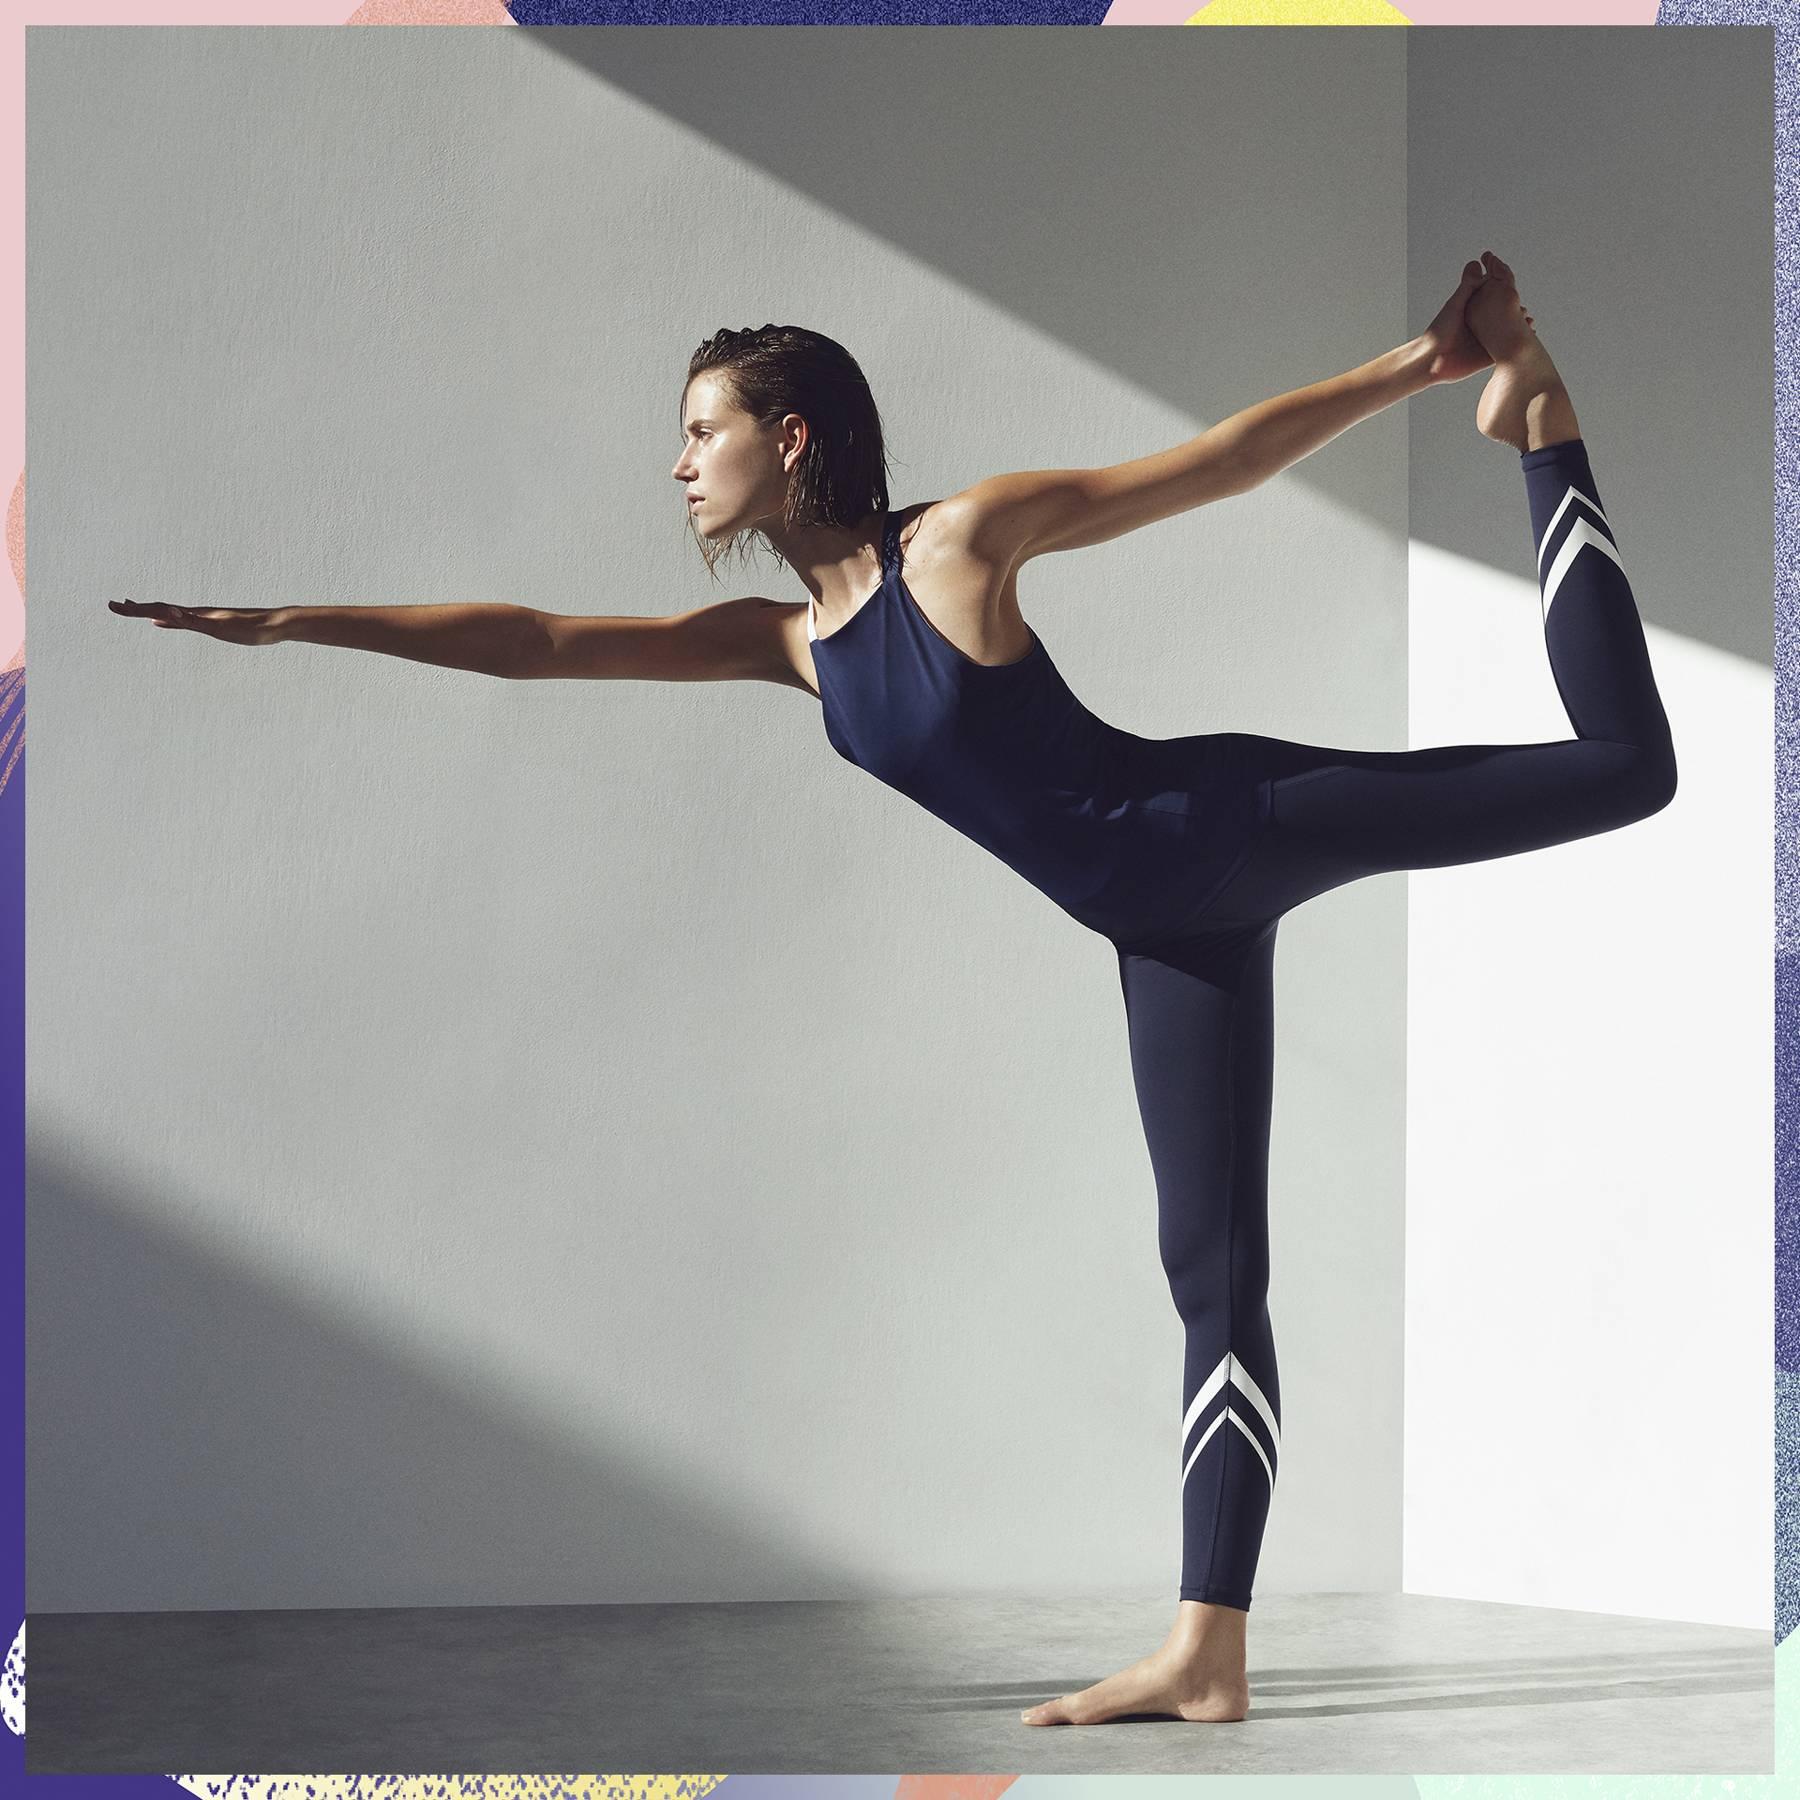 9c4f0908d771 Women s Gym Wear  Fashion Workout Clothes   Athleisure